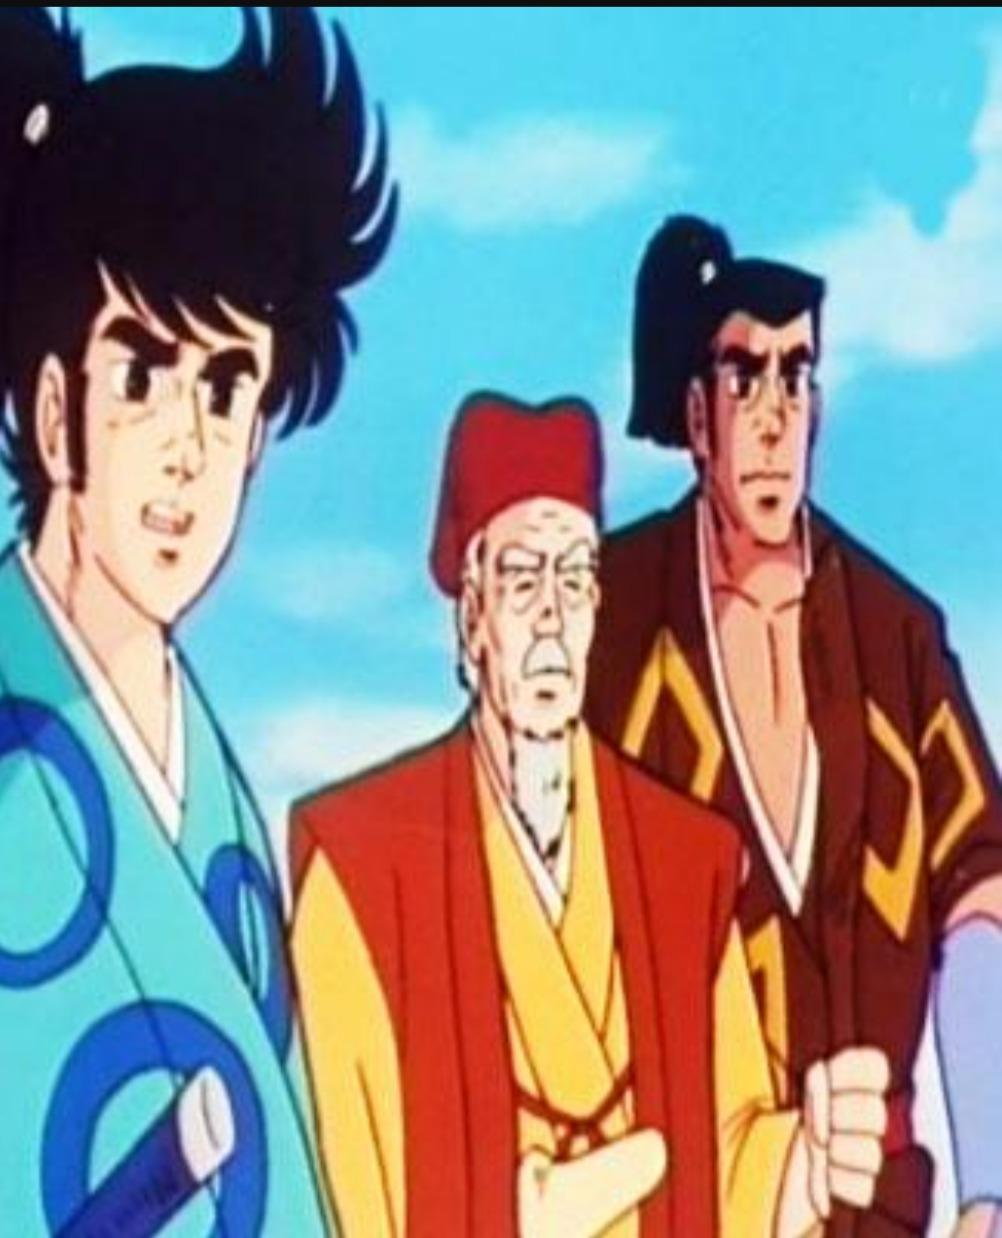 عکس کارتون های دهه 60: میتیکومون- داداش کایکو